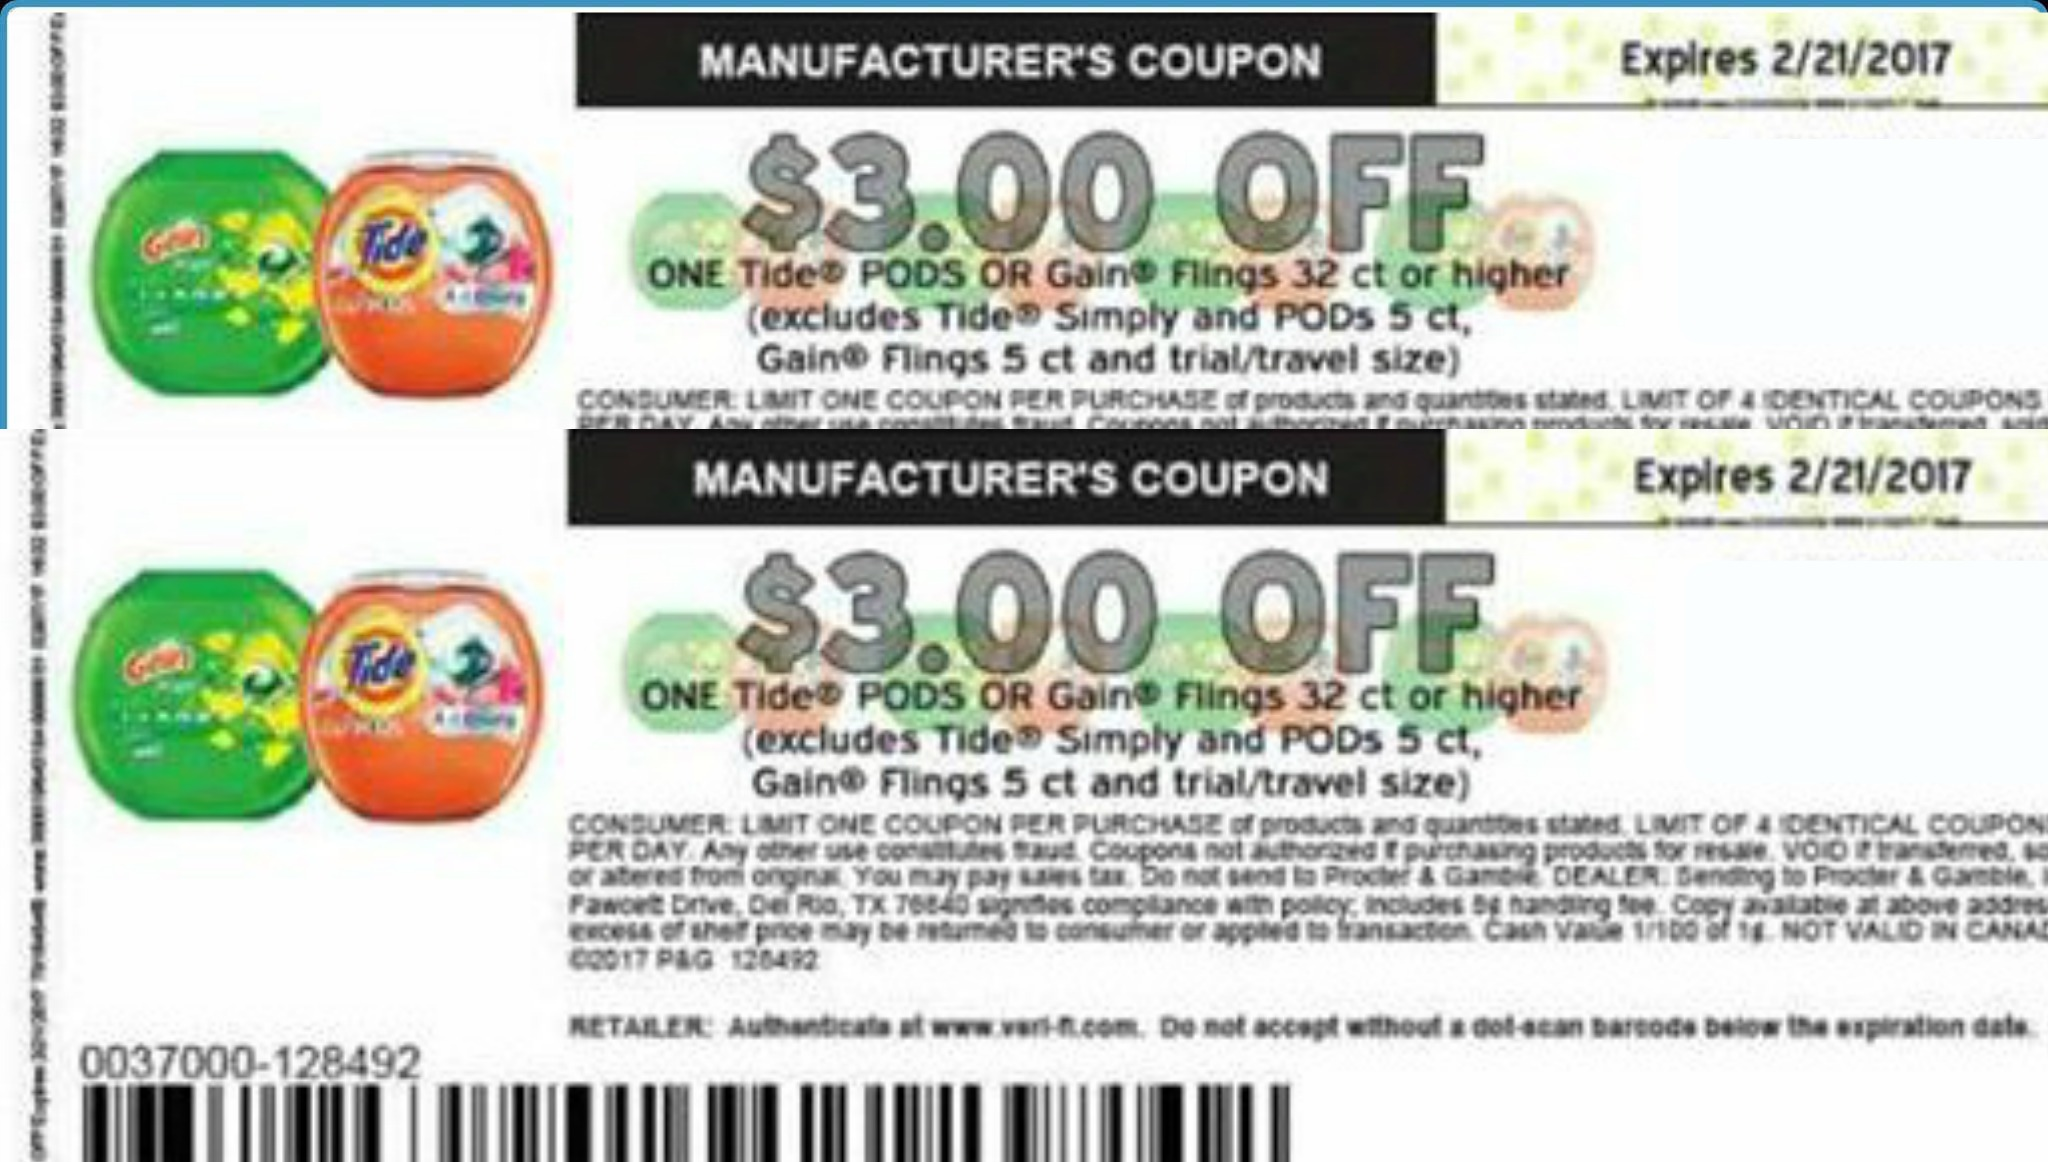 graphic regarding Printable Gain Coupons called Very hot Tide Pods or Financial gain Flings $3/1 printable coupon